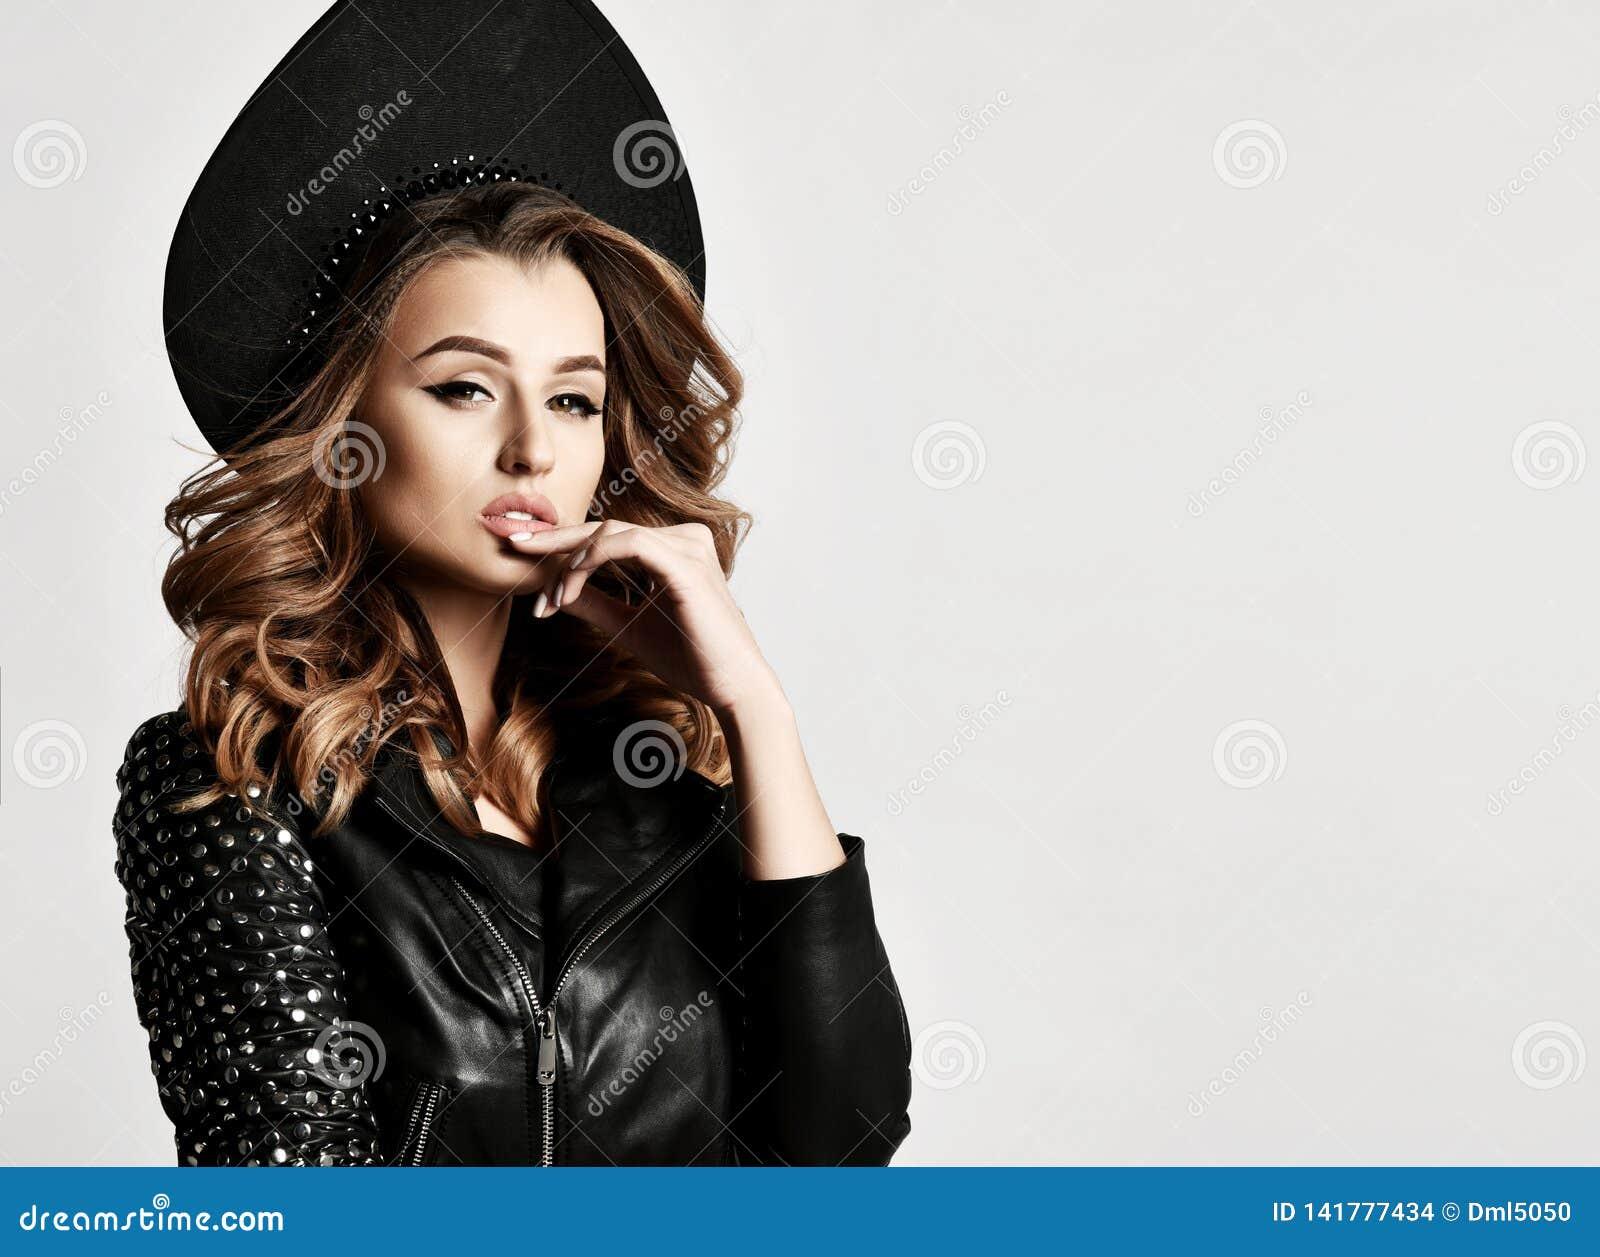 https://thumbs.dreamstime.com/z/beauty-woman-new-modern-fashion-leather-jacket-russian-style-kokoshnik-hat-gray-thinking-background-141777434.jpg